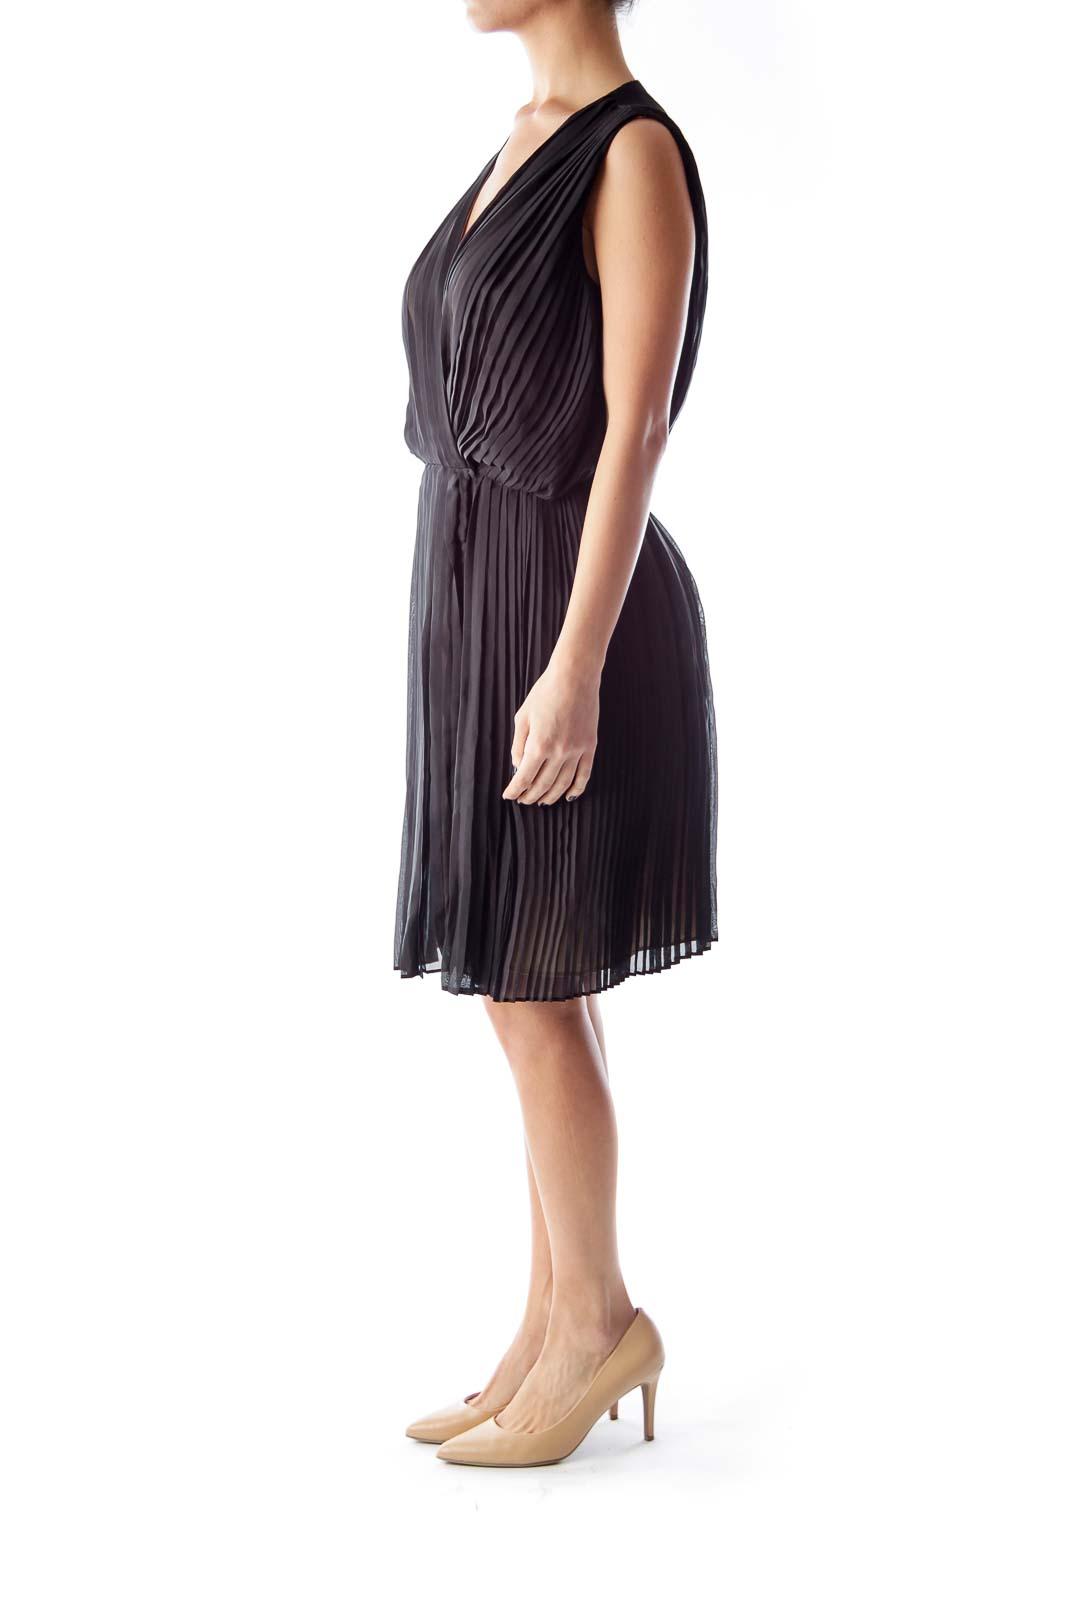 Black Plaid Cocktail Dress